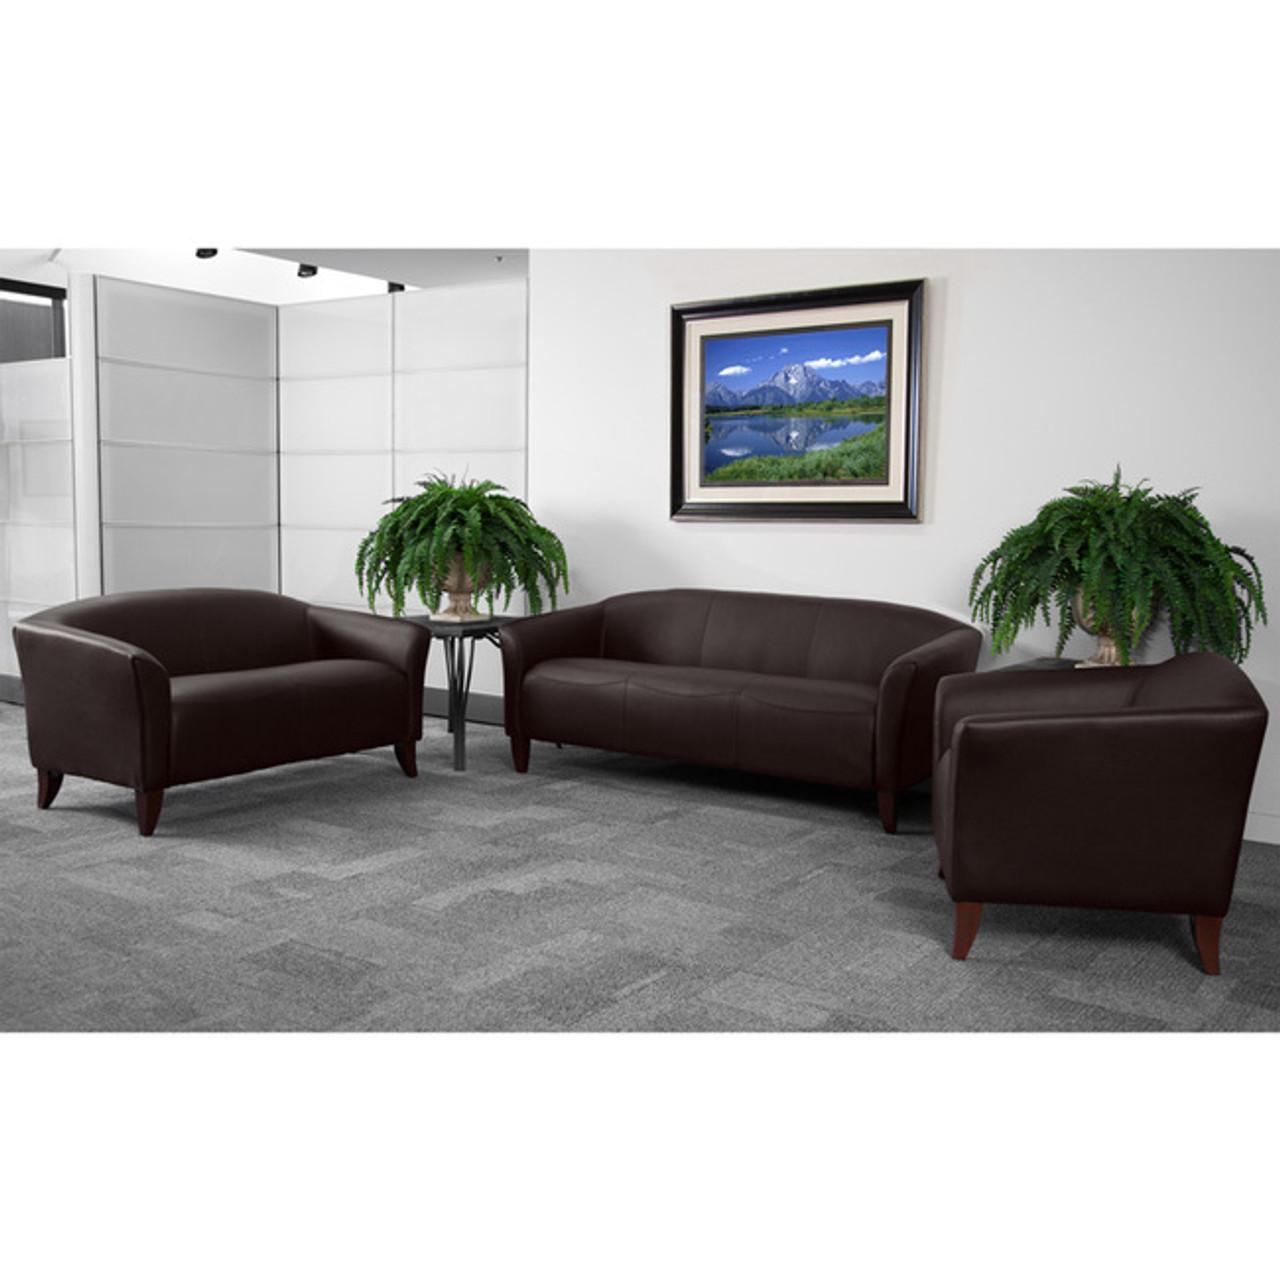 3pc Modern Leather Office Reception Sofa Set, FF-0536-13-S1